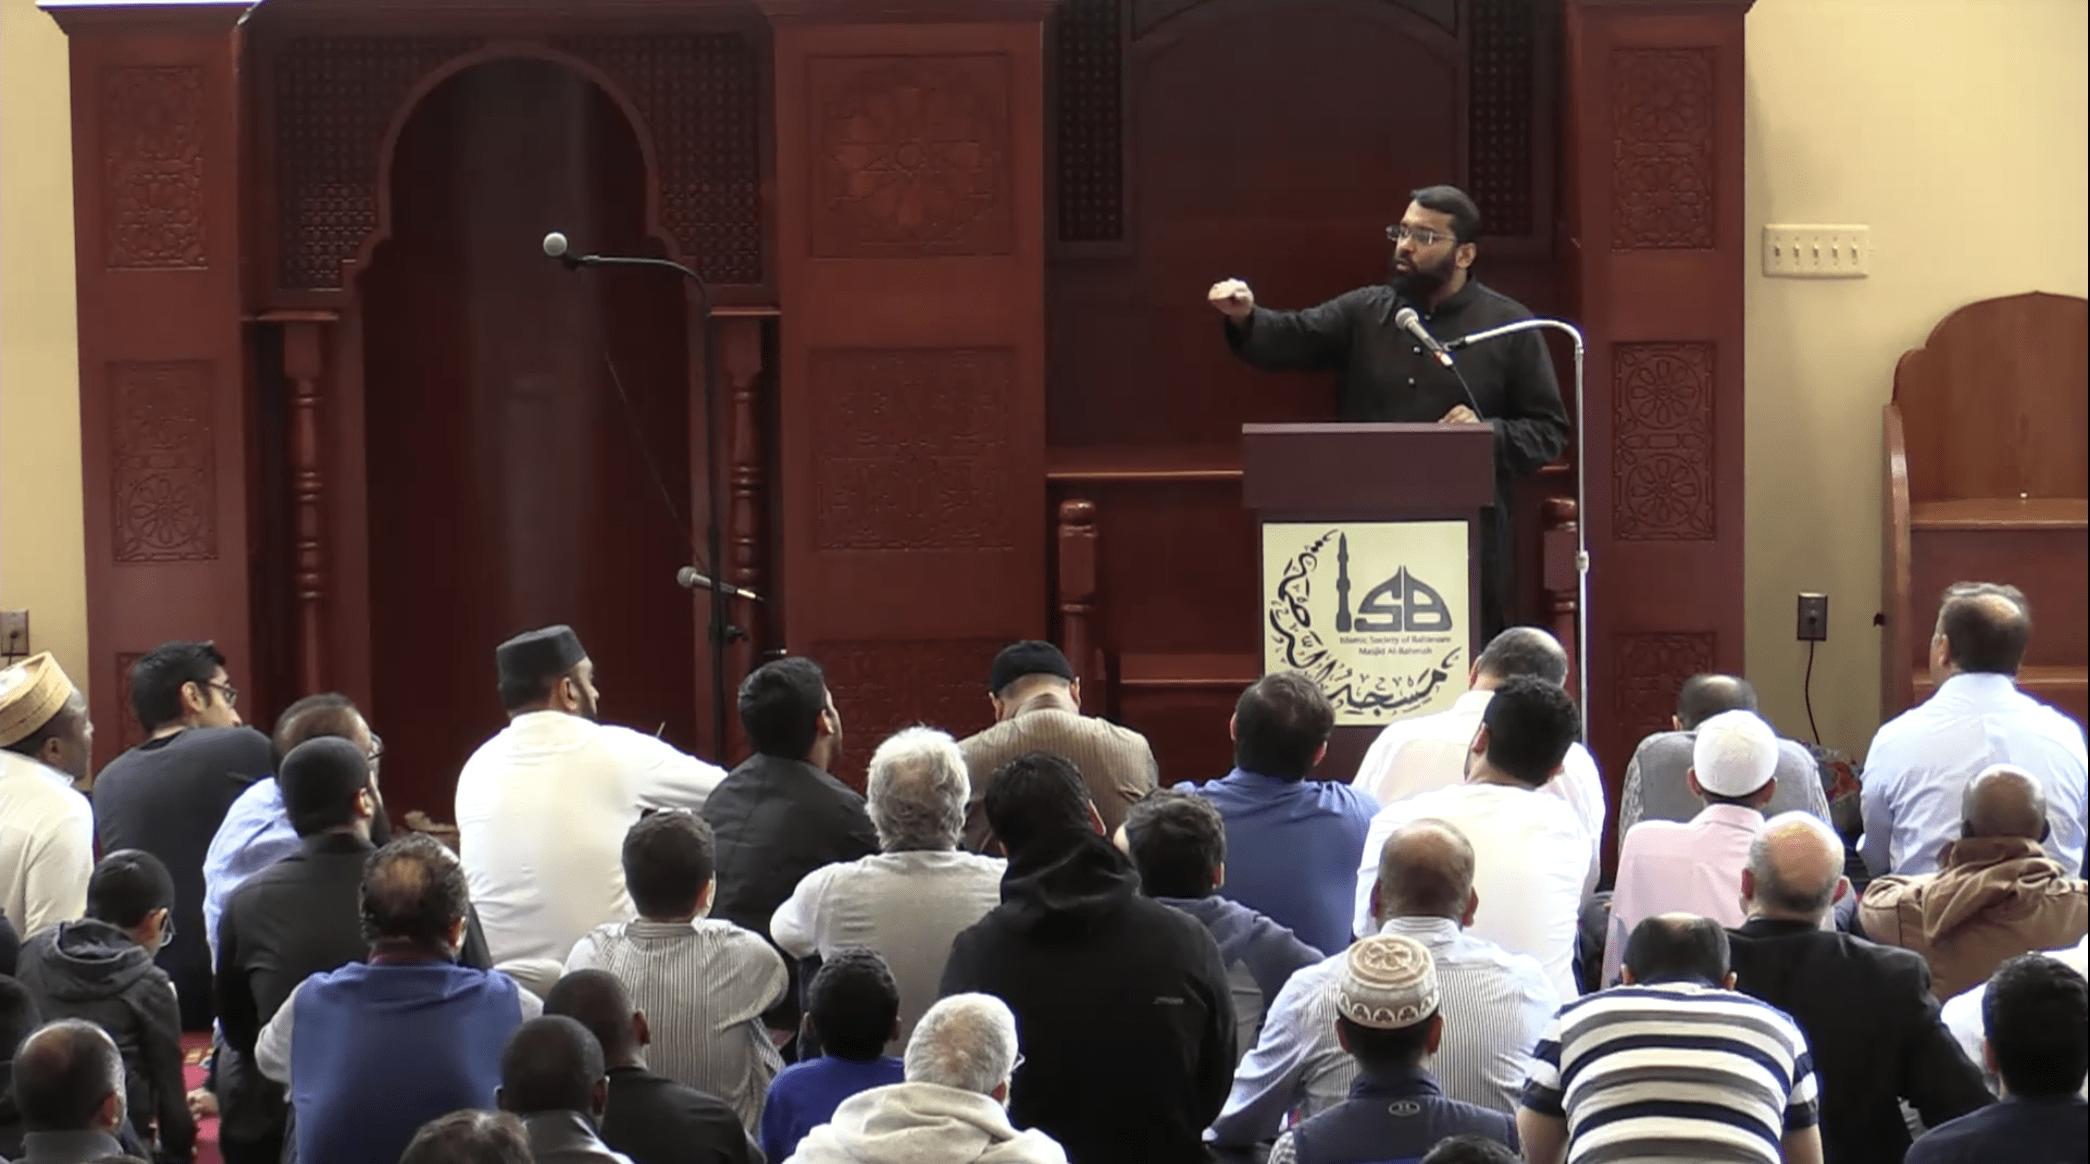 Yasir Qadhi – Qalb e Saleem (A Pure Heart)